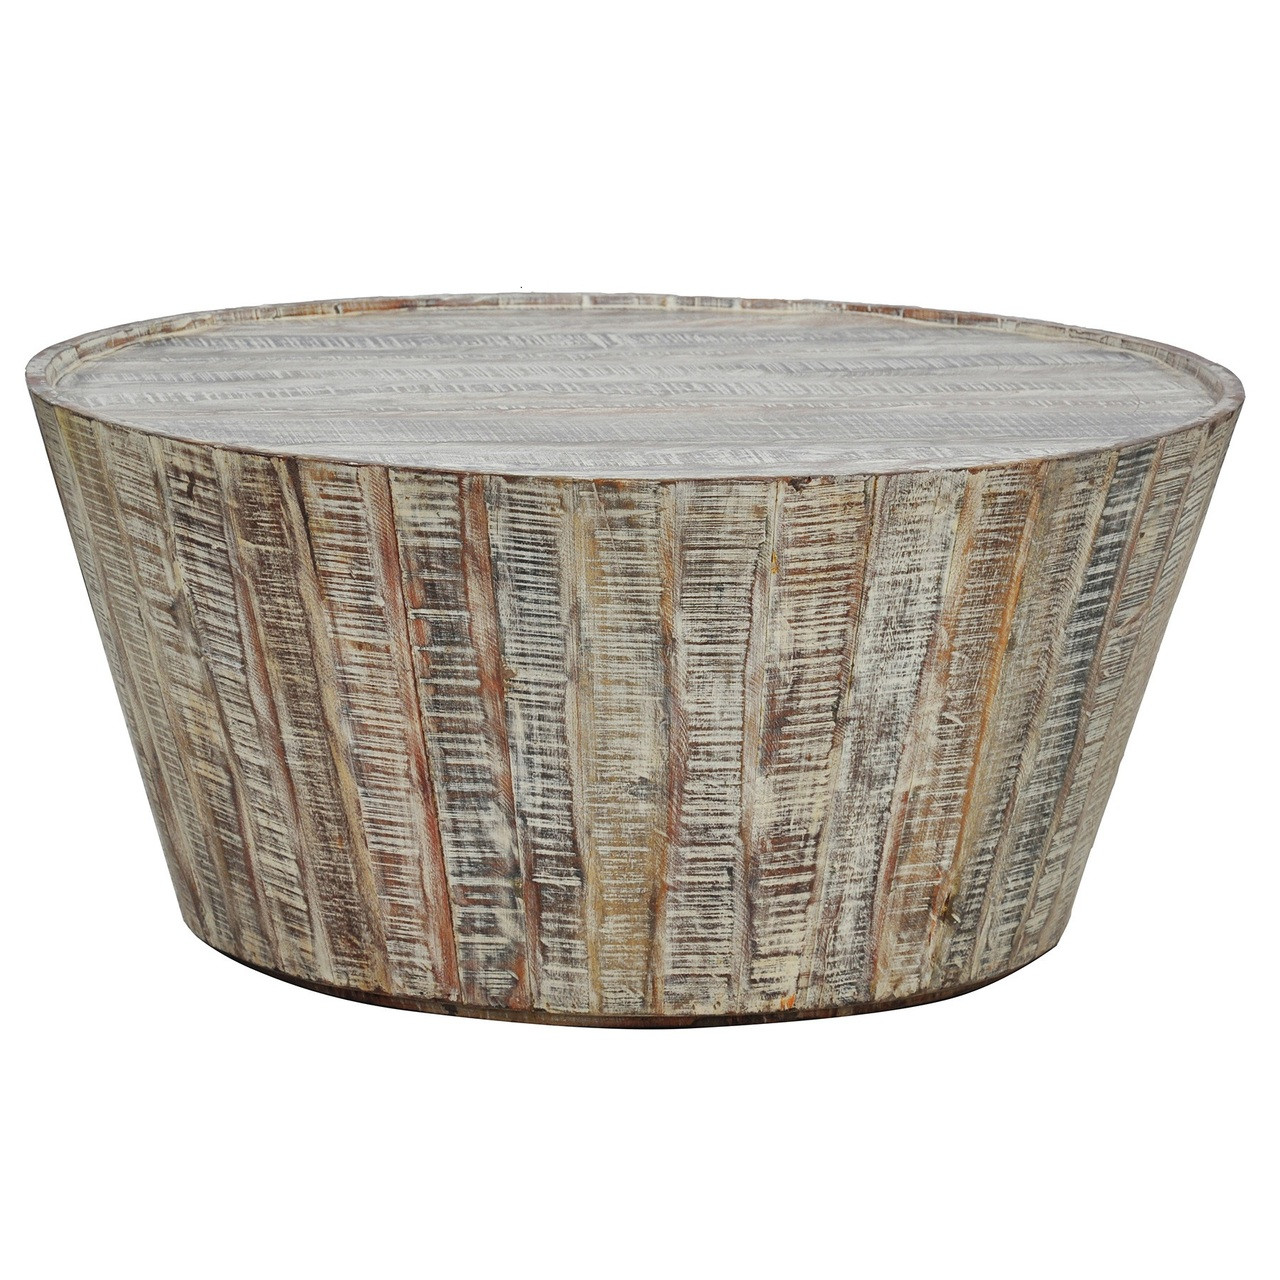 Hampton Rustic Wood Round Barrel Coffee Table 38 Zin Home